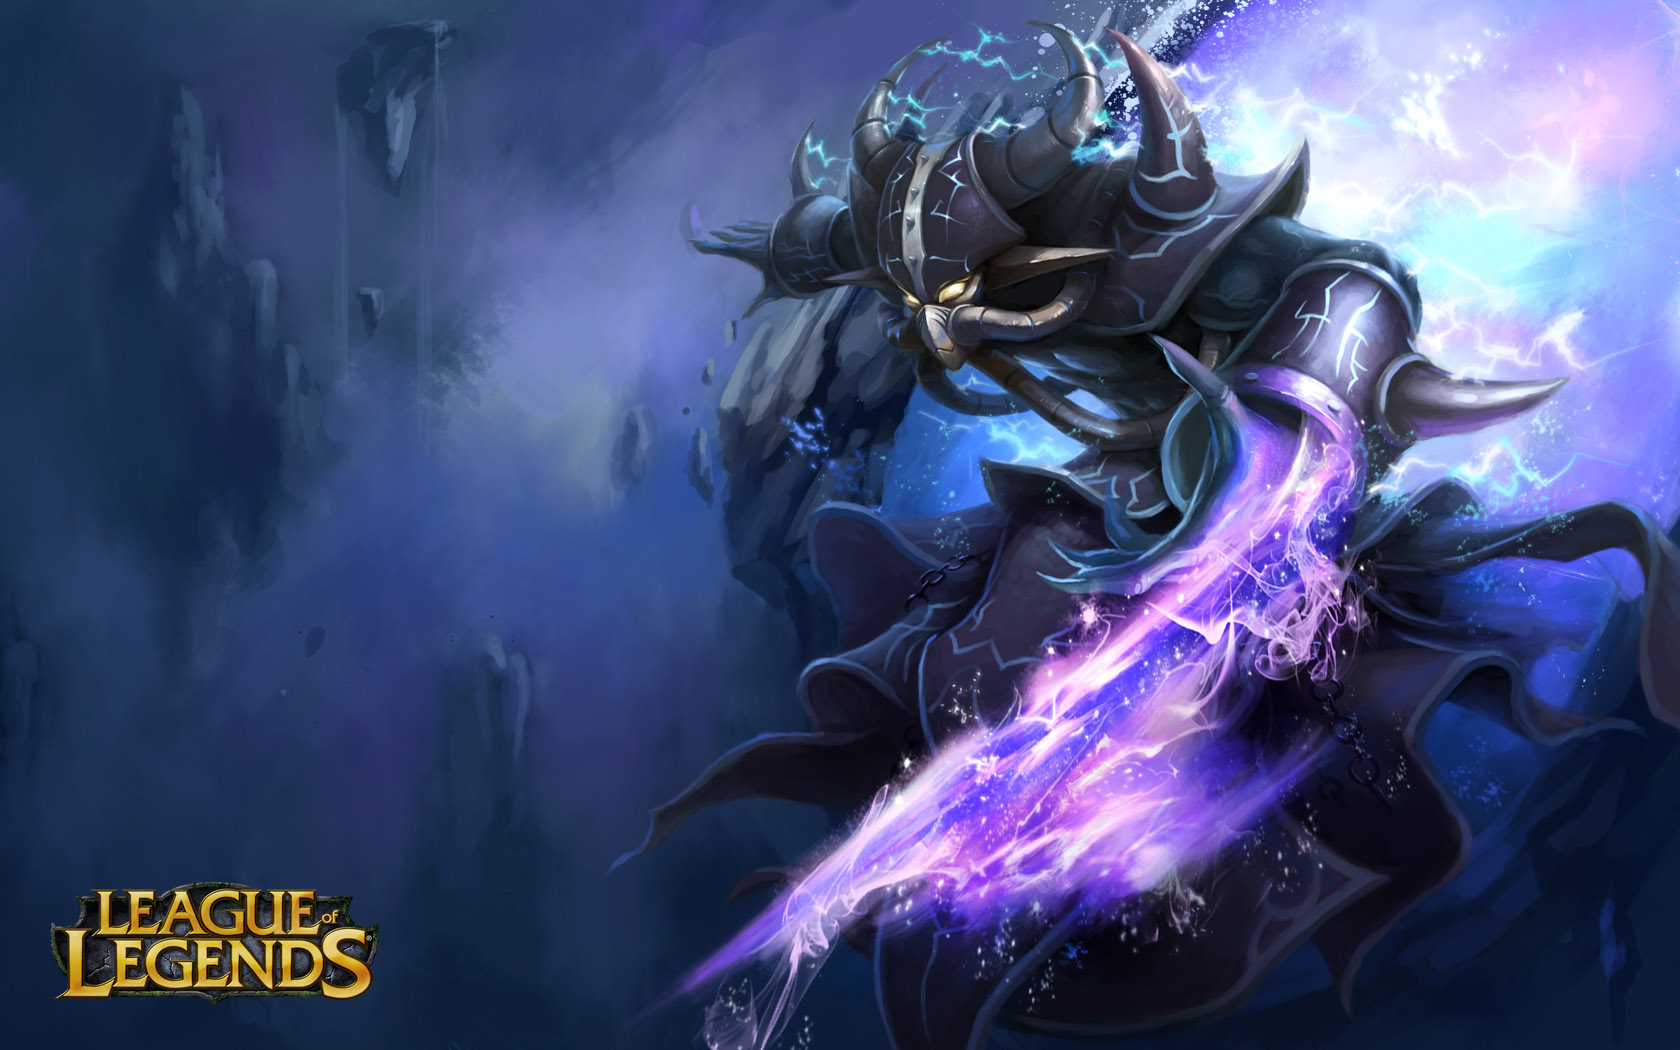 League of Legends wallpaper 9